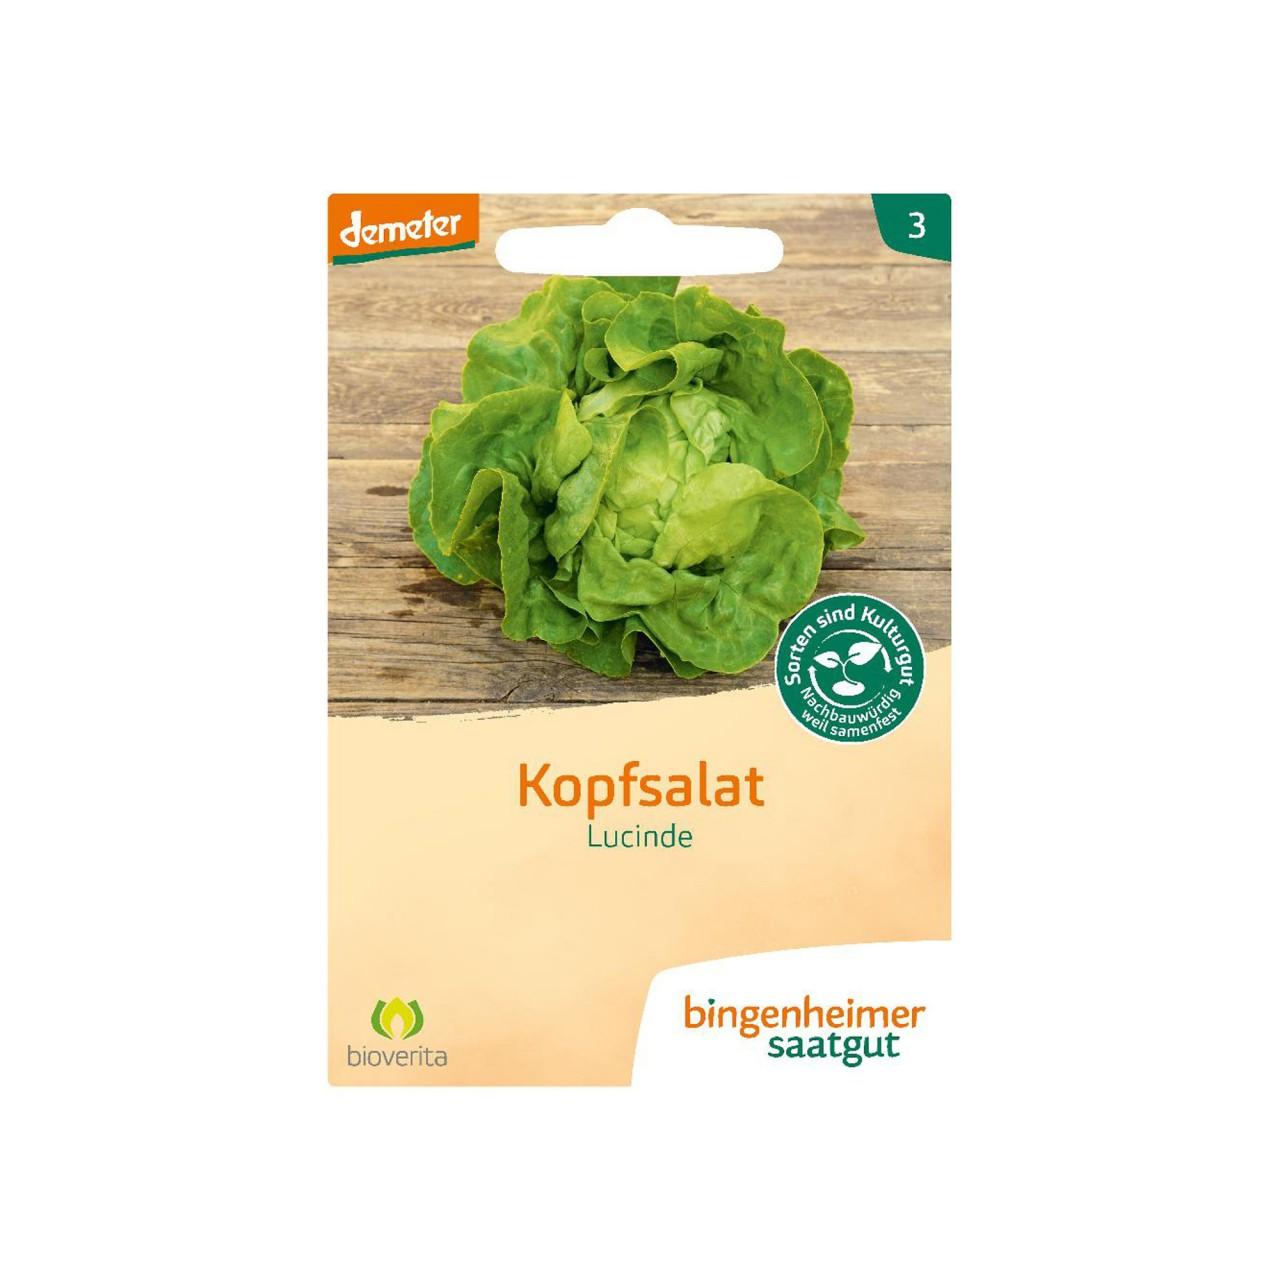 Bingenheimer Kopfsalat Lucinde - Bio-Saatgut